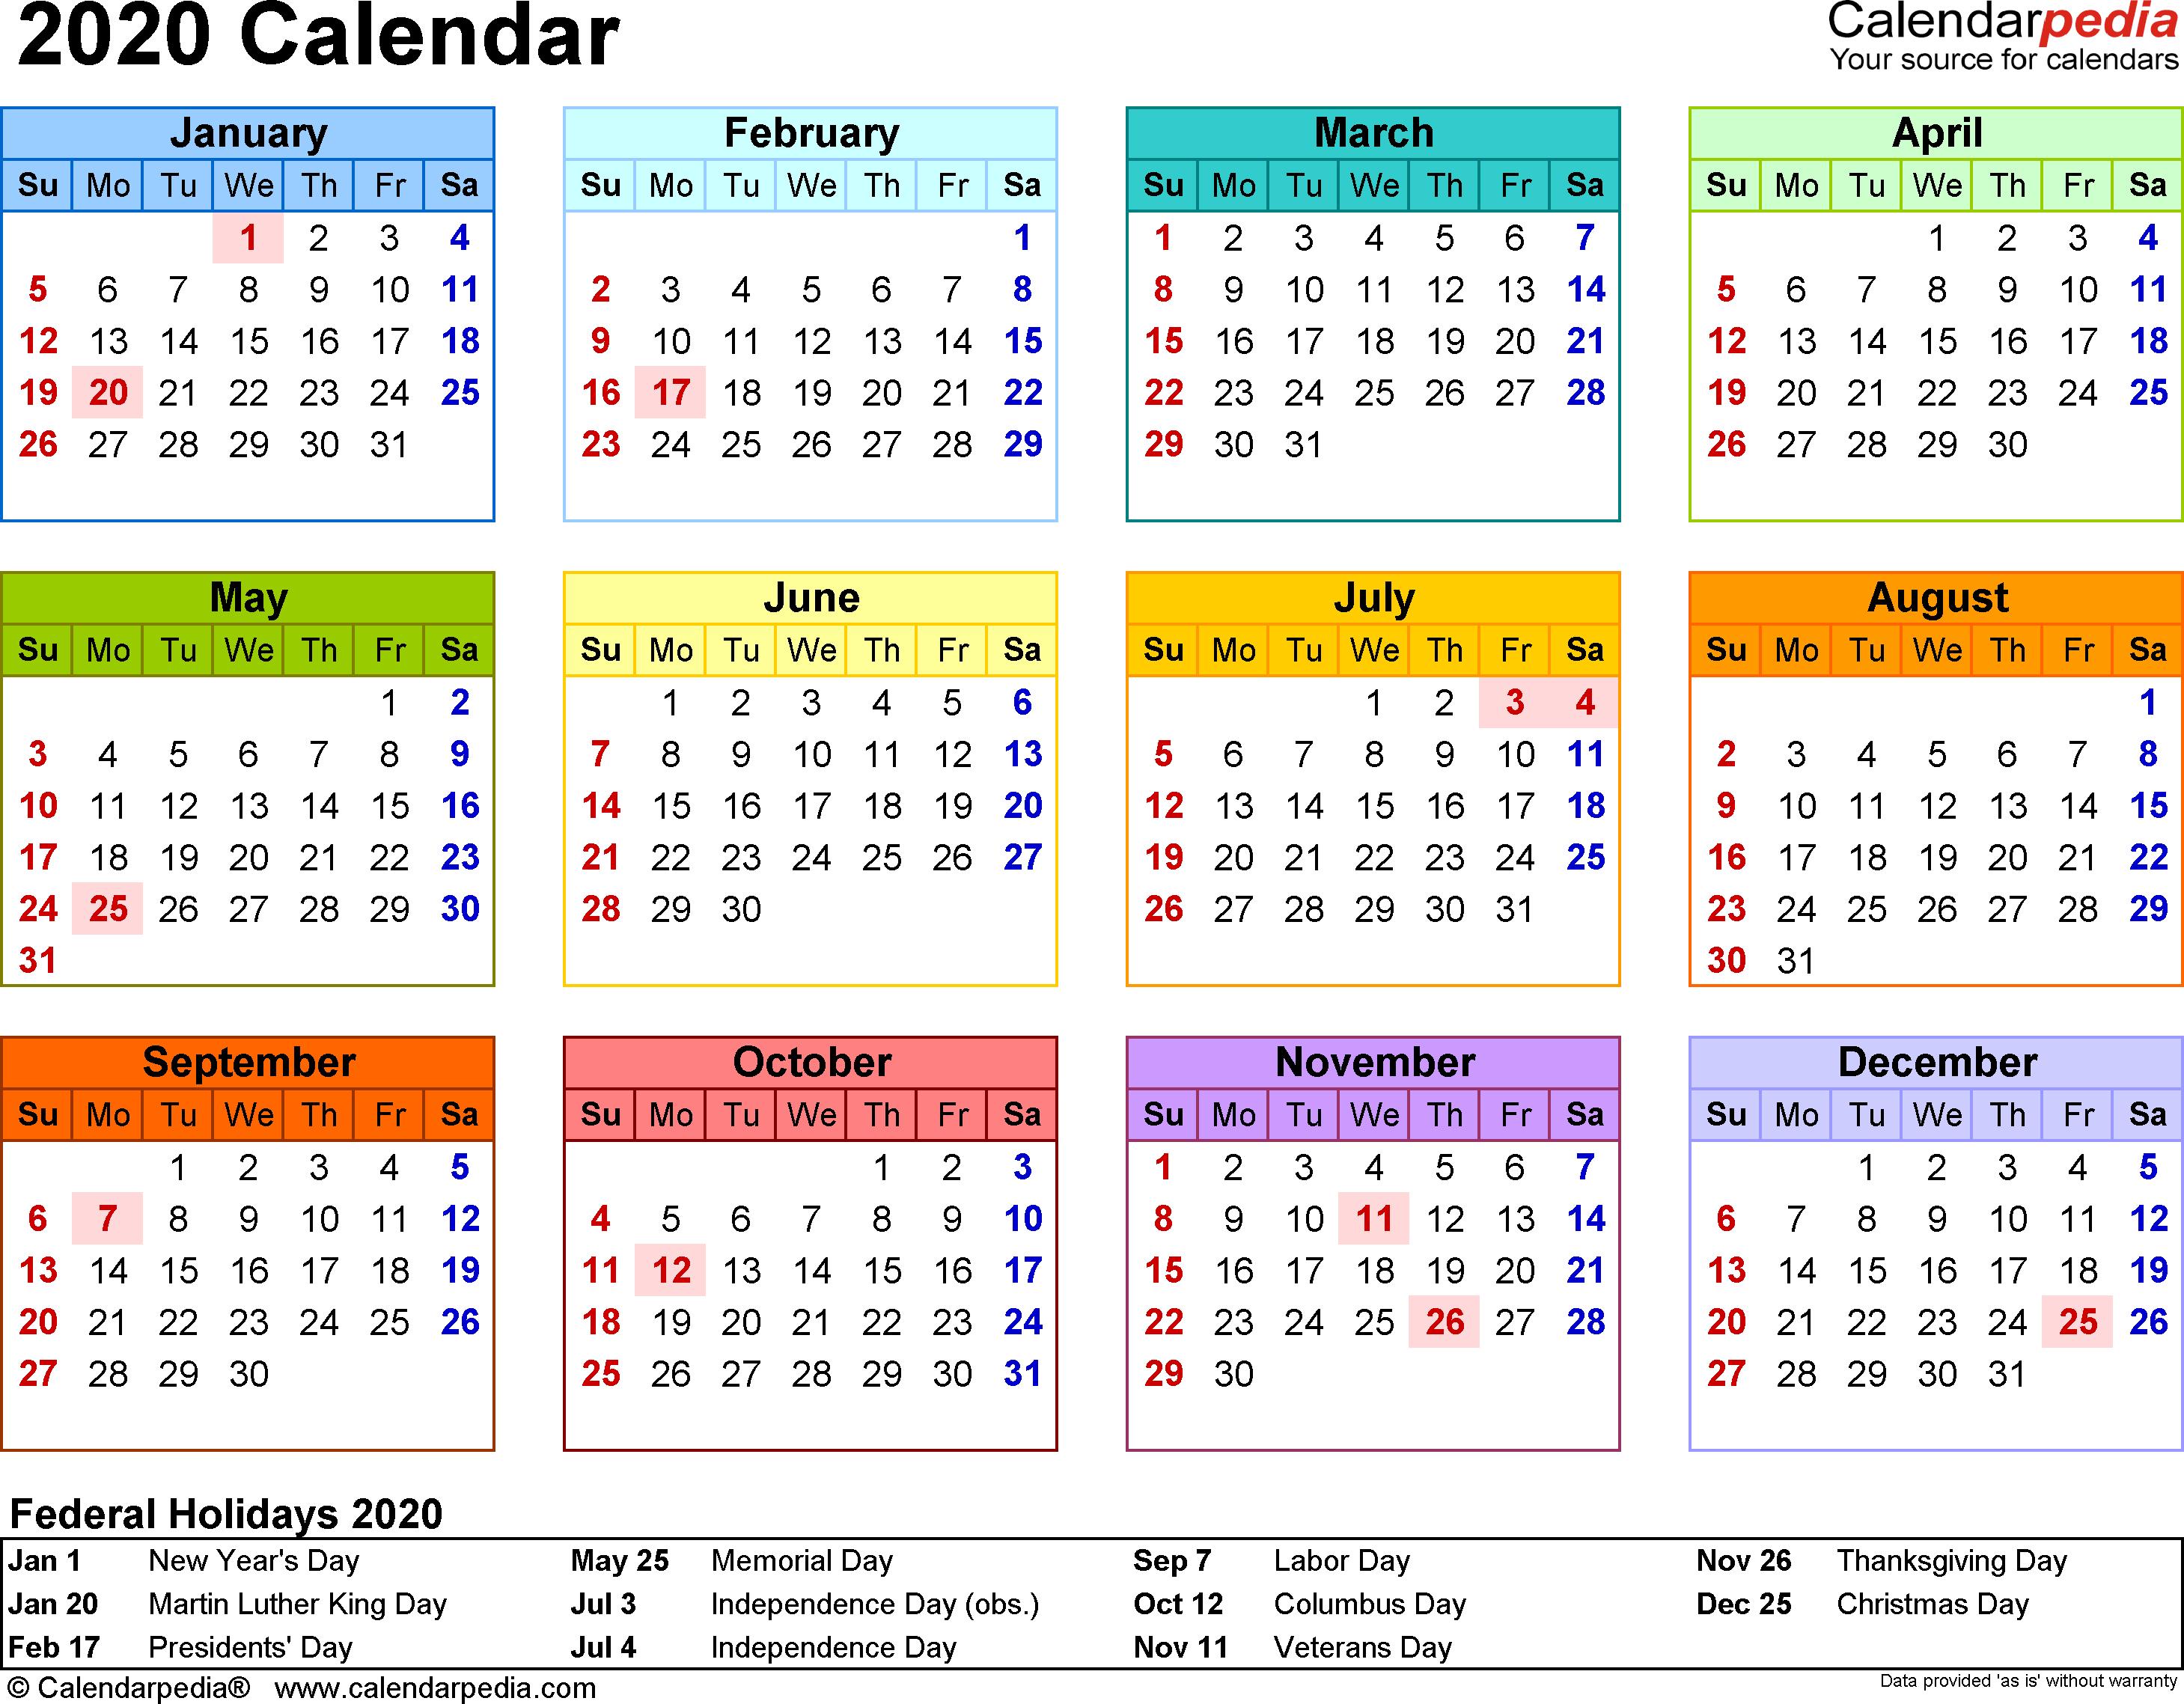 2020 Calendar Pdf - 17 Free Printable Calendar Templates within Printable 2020 Calendars No Download